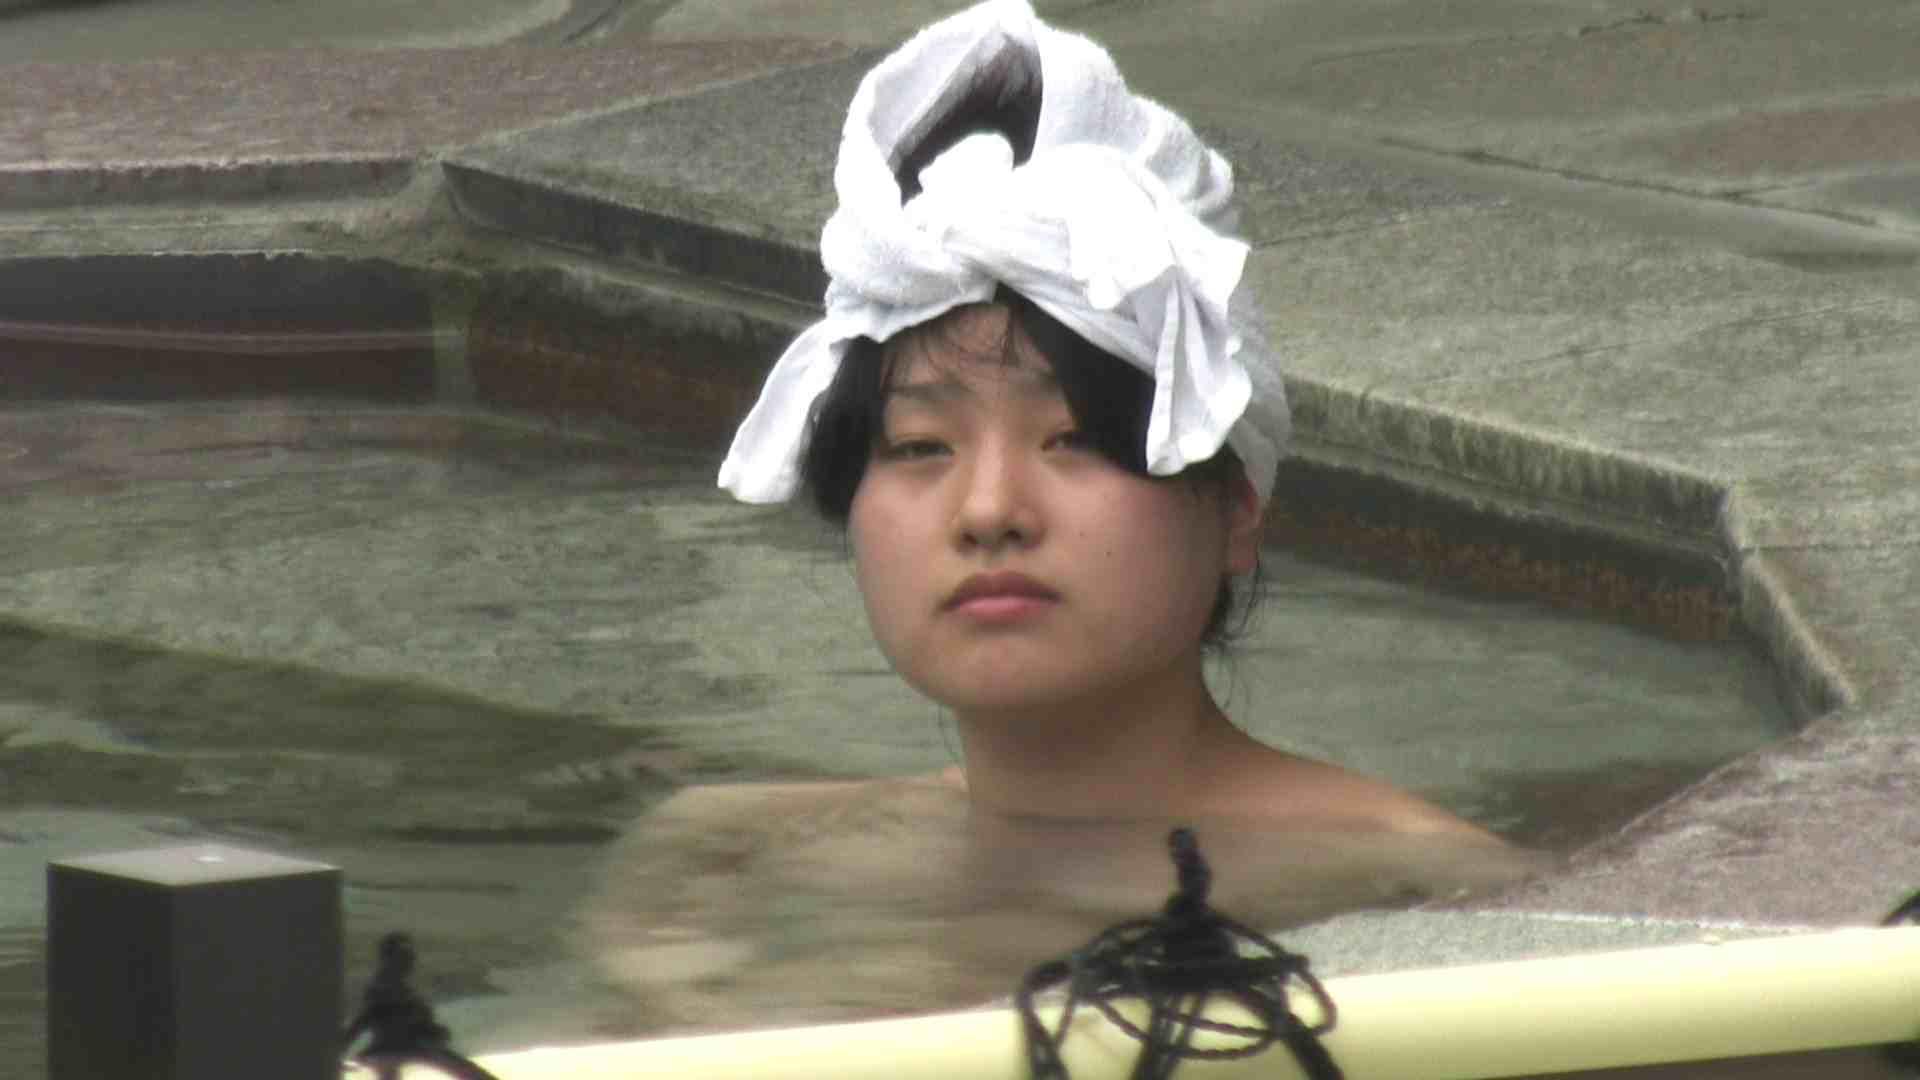 Aquaな露天風呂Vol.185 盗撮   HなOL  102pic 81